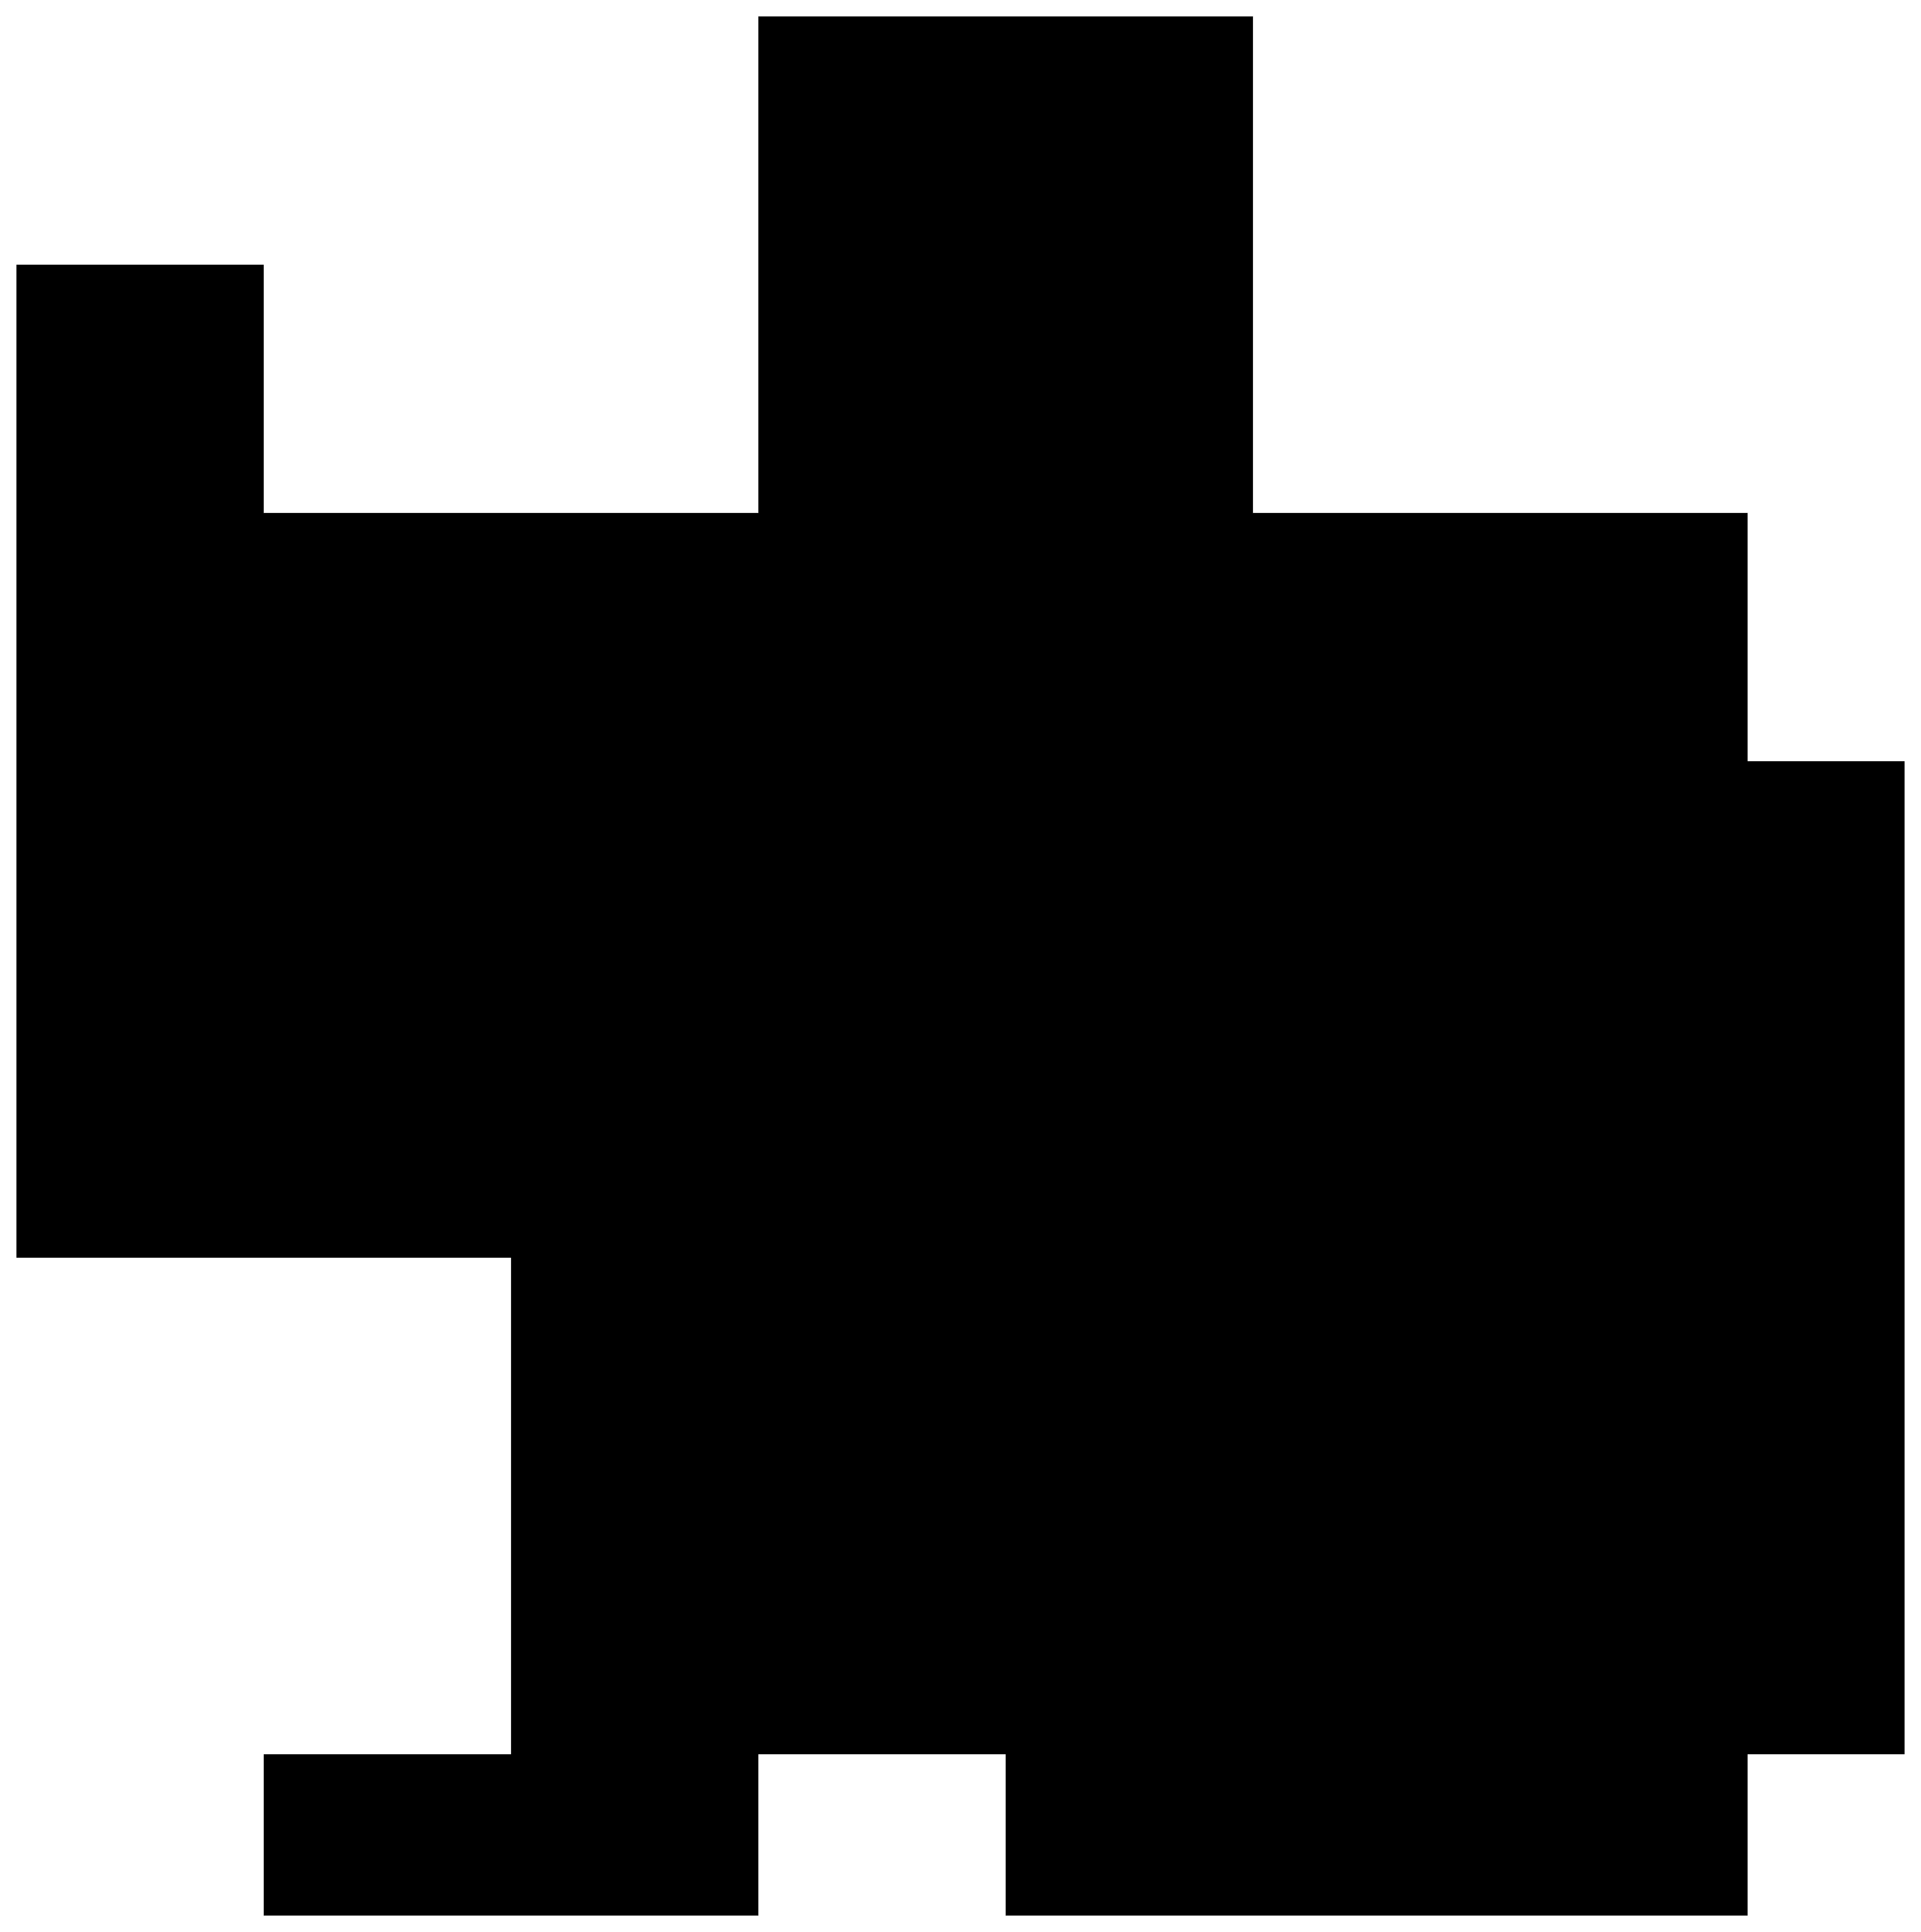 Jockey Silhouette PNG Clip Art Image.